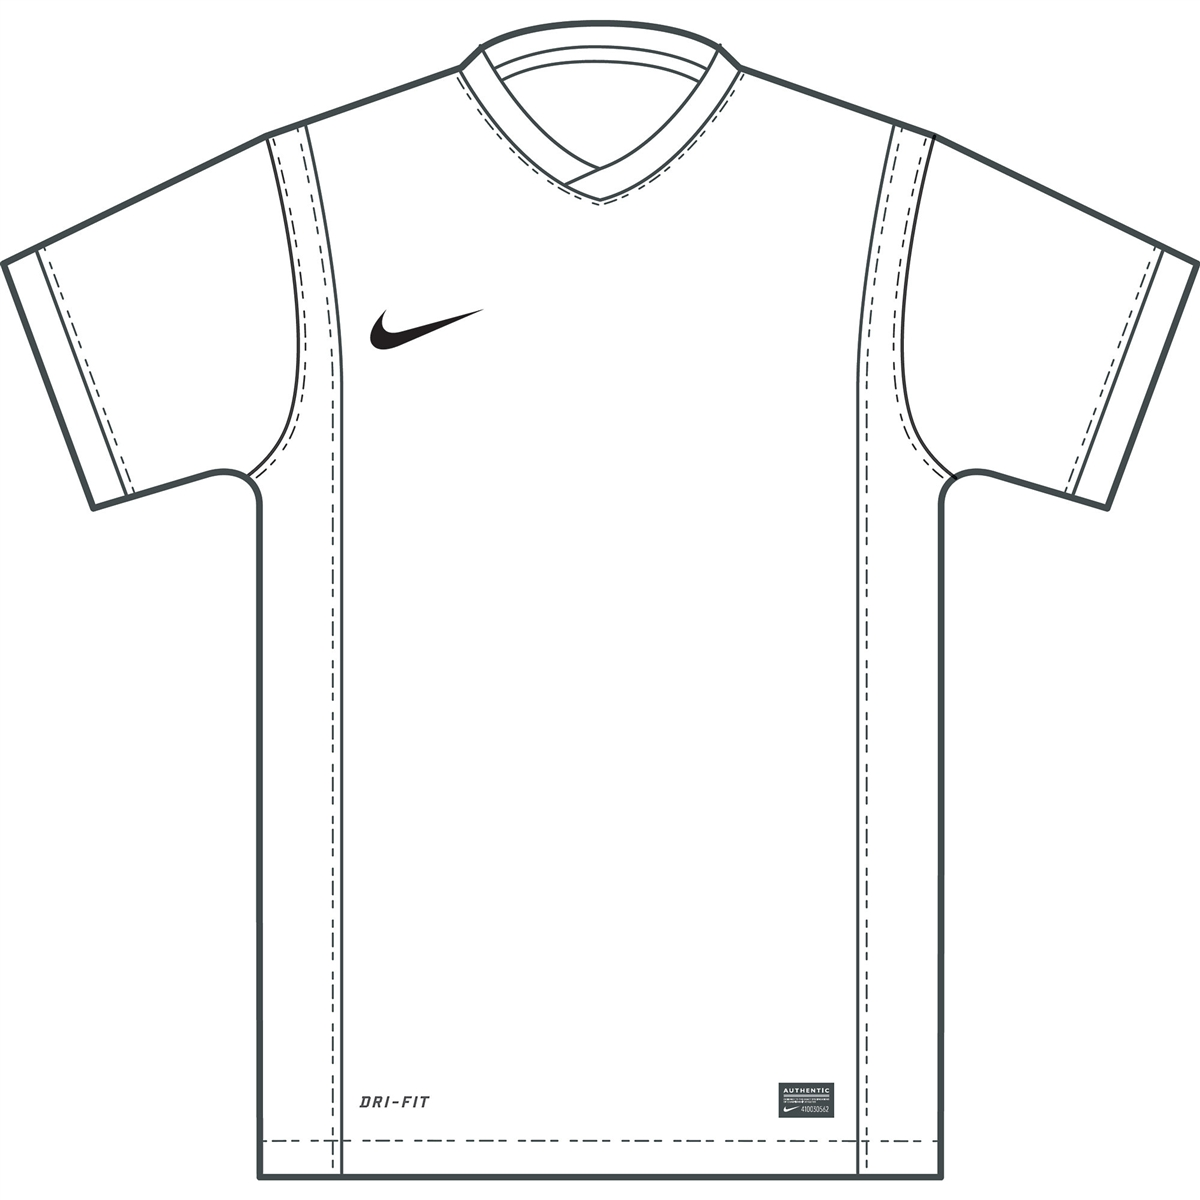 Nike 14 15 Teamwear Trikots   Nike 2014 2015 Templates ...